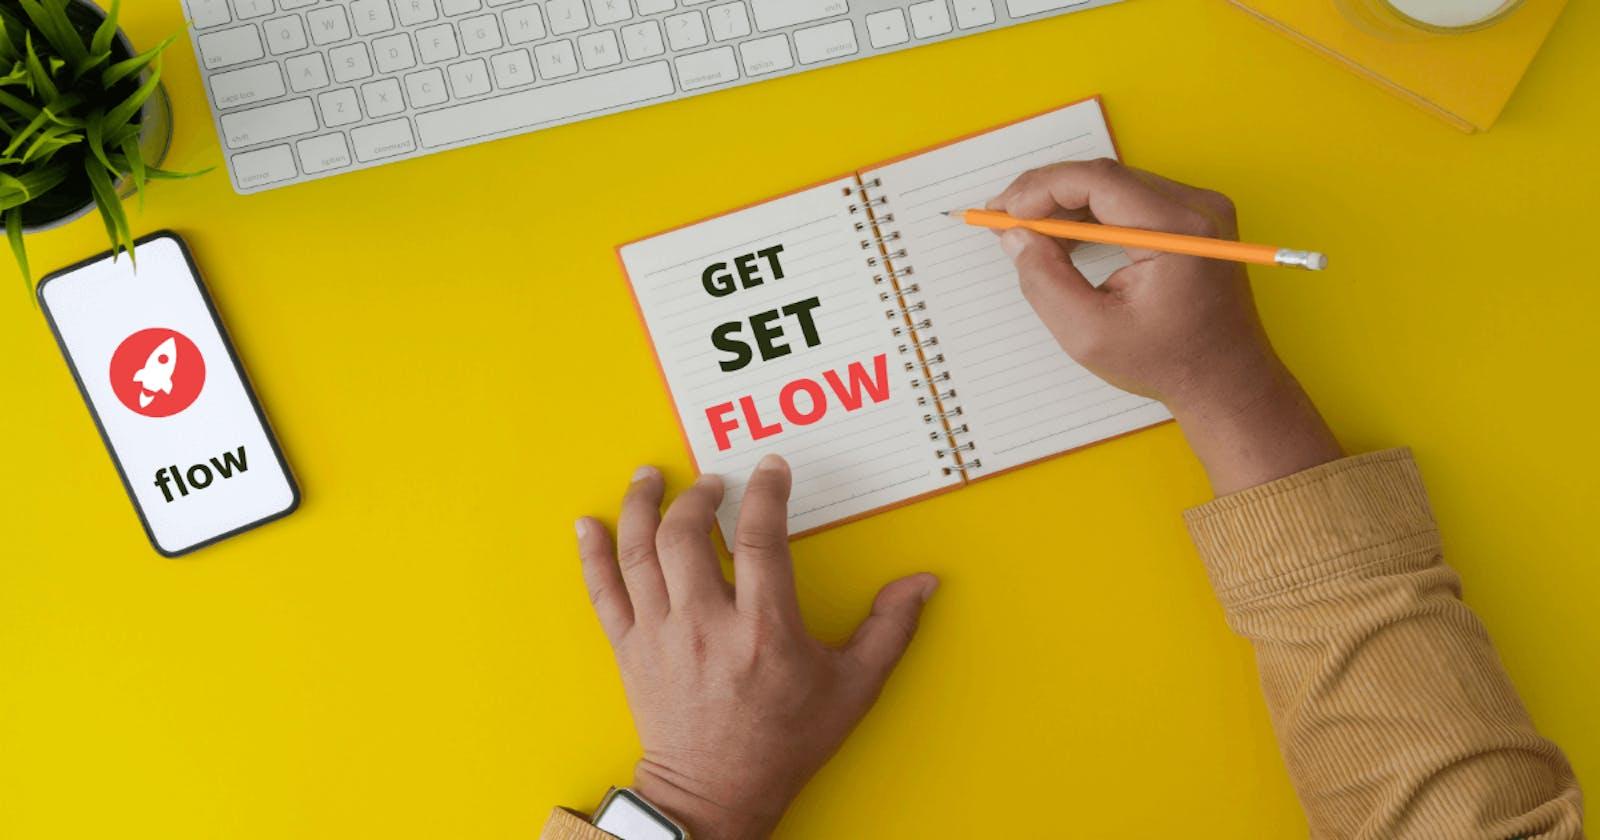 Introducing Flow - The Minimalist Productivity App